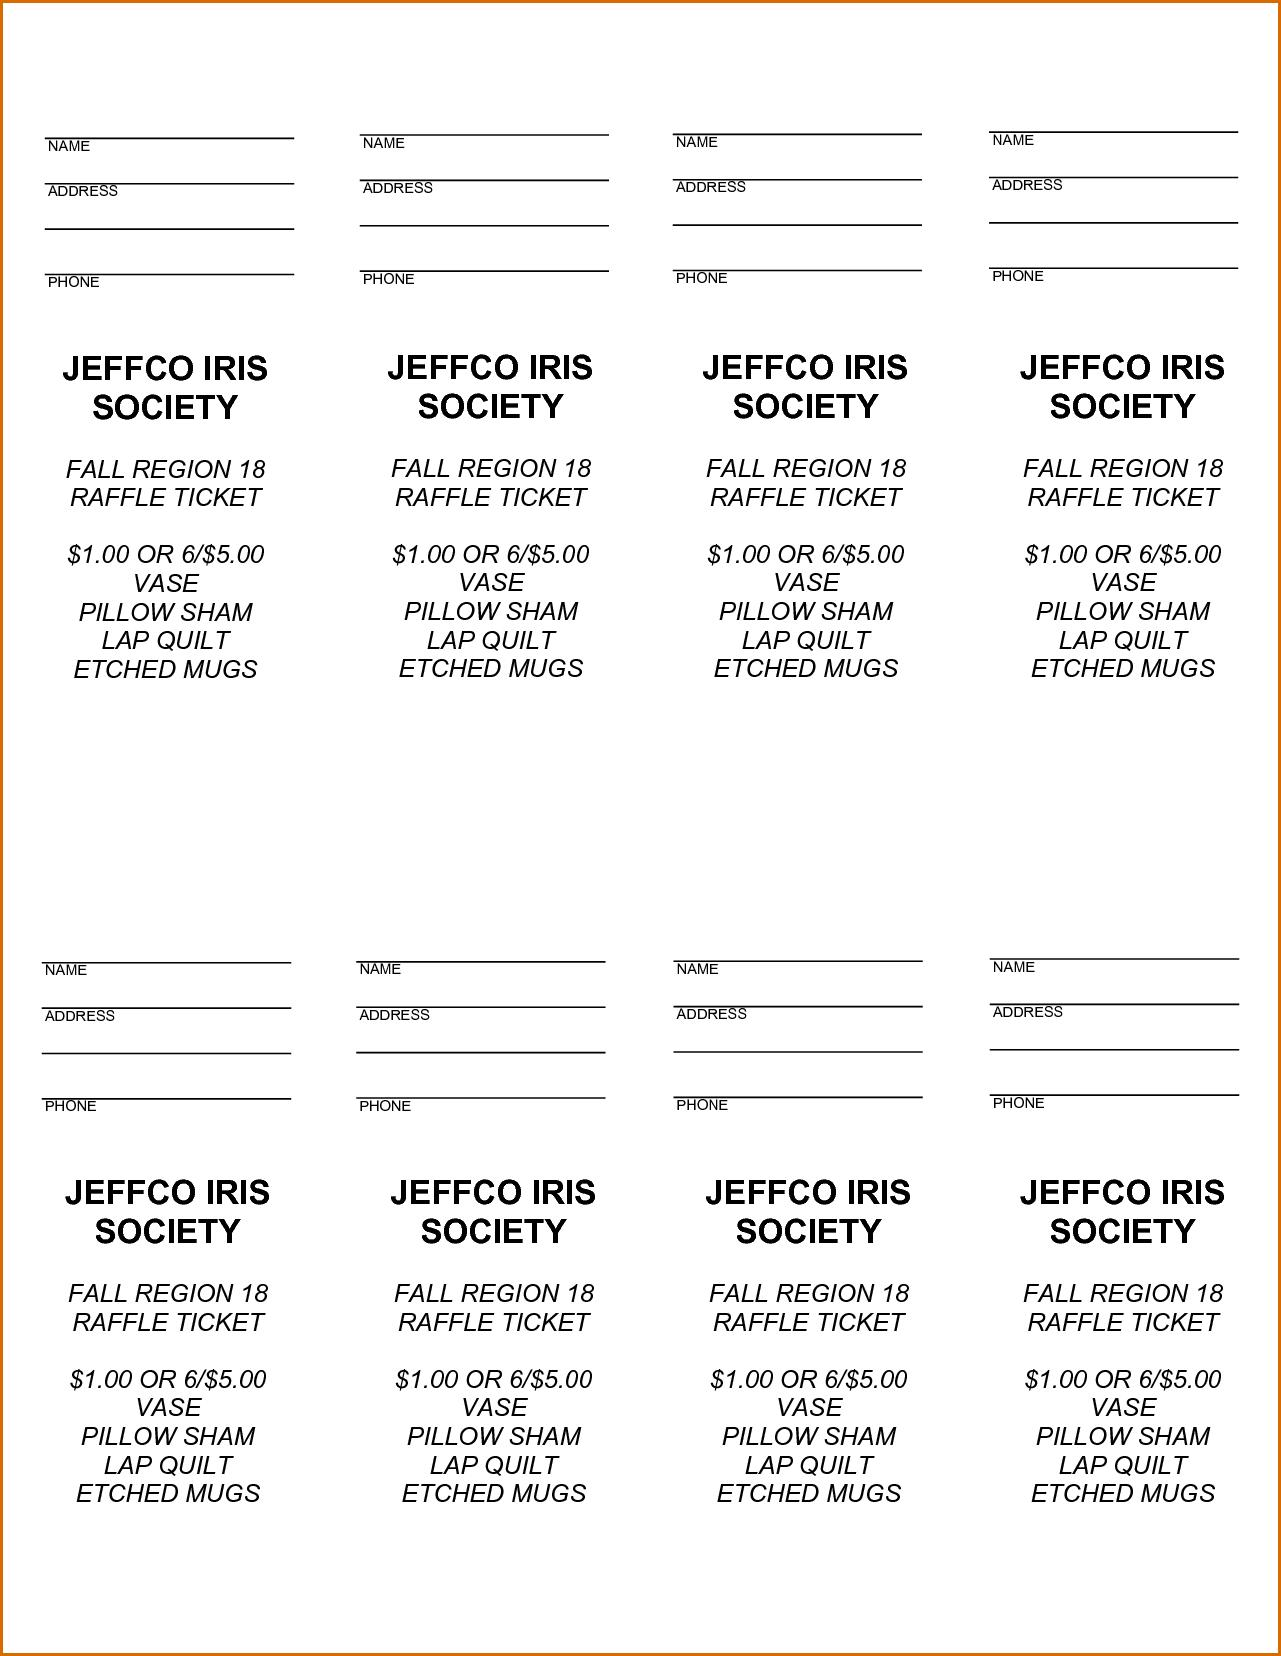 Pinjoanna Keysa On Free Tamplate | Pinterest | Ticket Template - Free Printable Raffle Ticket Template Download